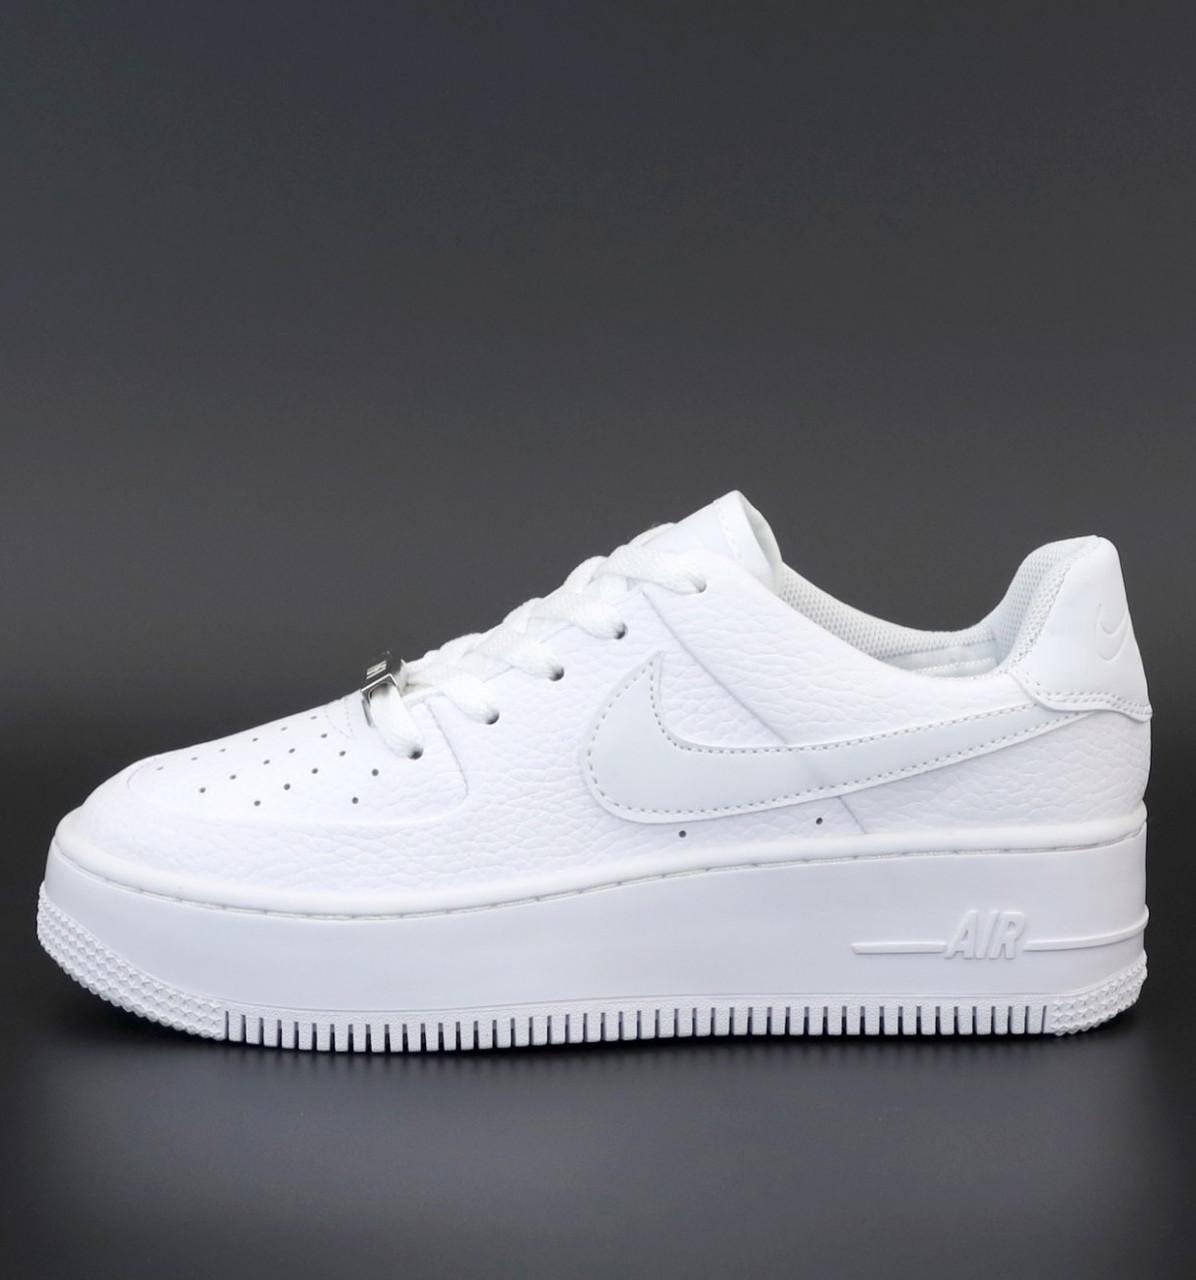 Женские кроссовки Nike Air Force 1 Sage White, Найк аир форс